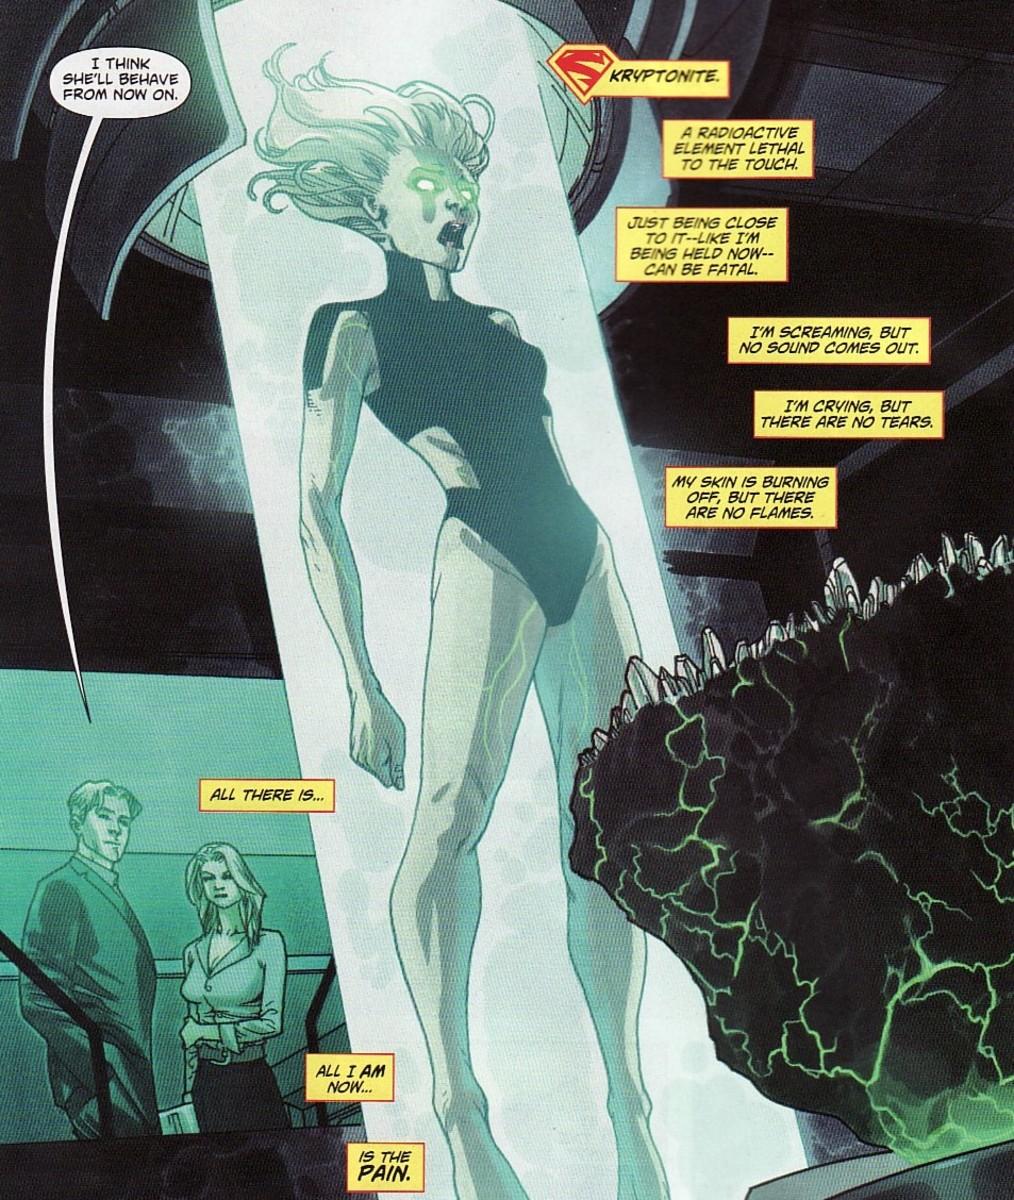 Supergirl exposed to Kryptonite